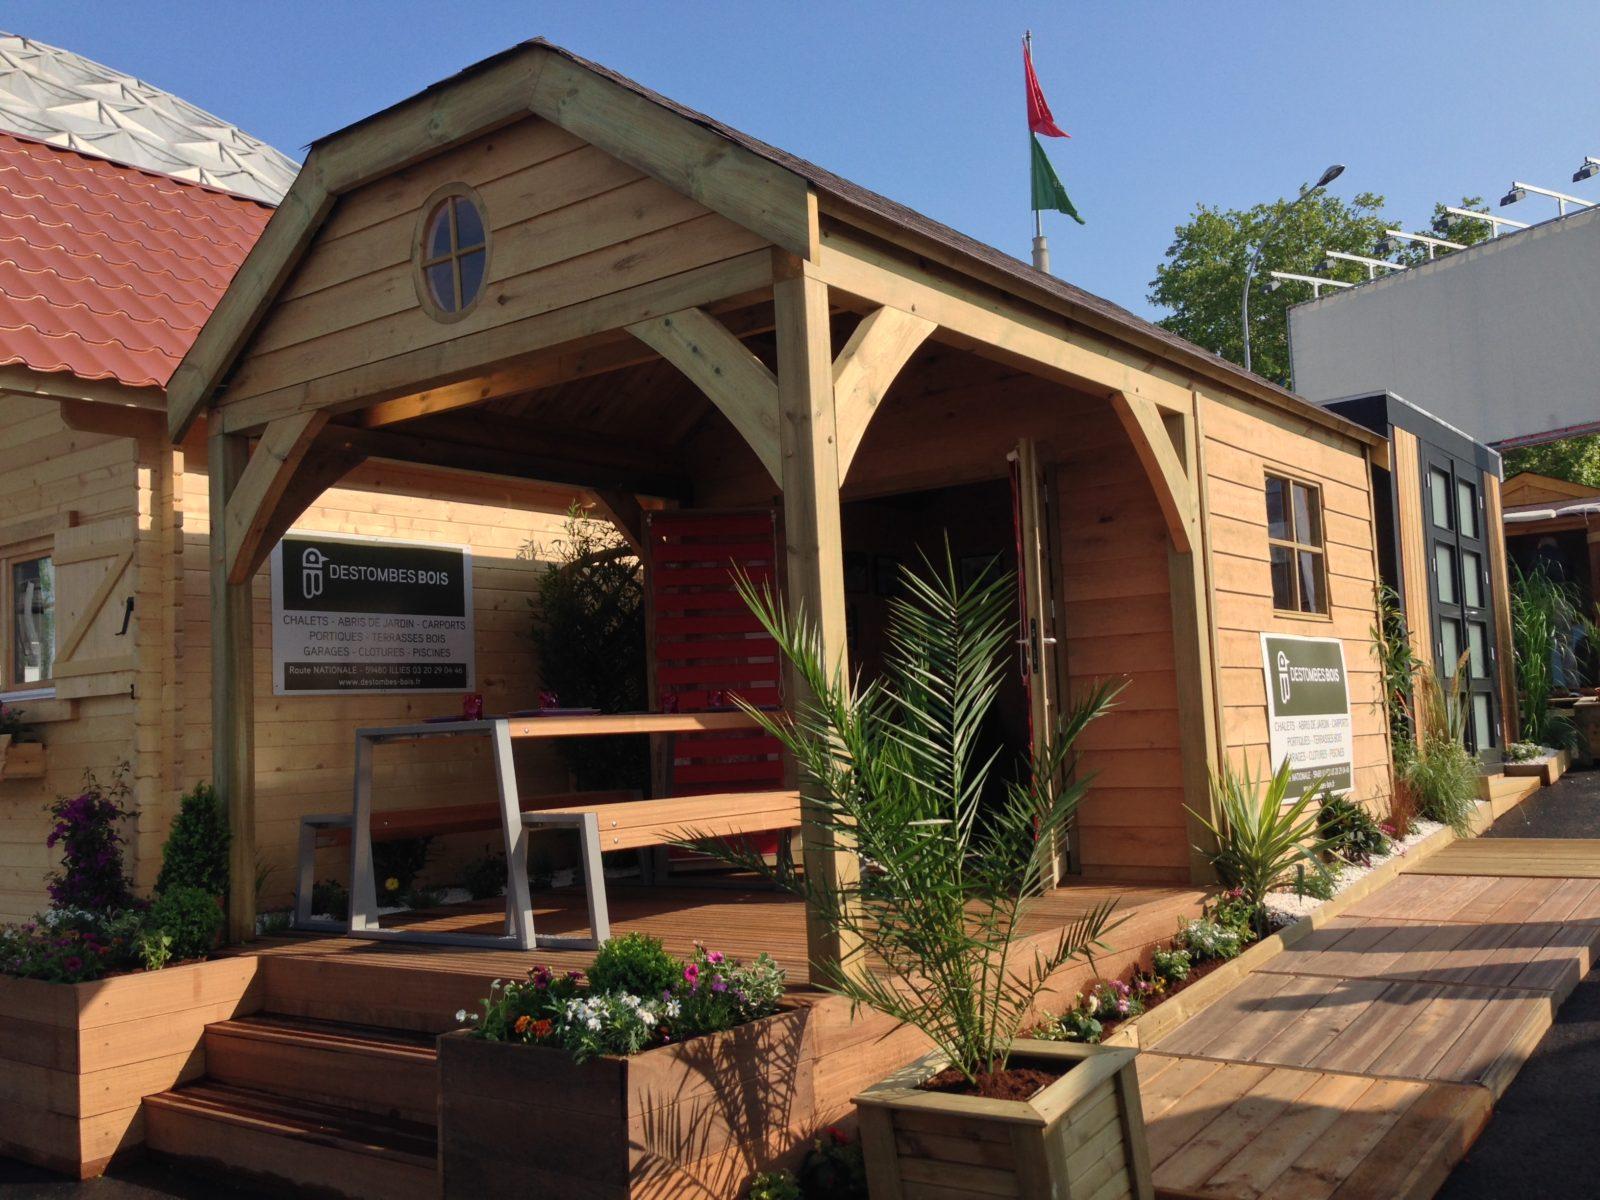 Destombes Bois | Abri De Jardin Bois - Garage - Carport ... tout Abri De Jardin Bois Sur Mesure